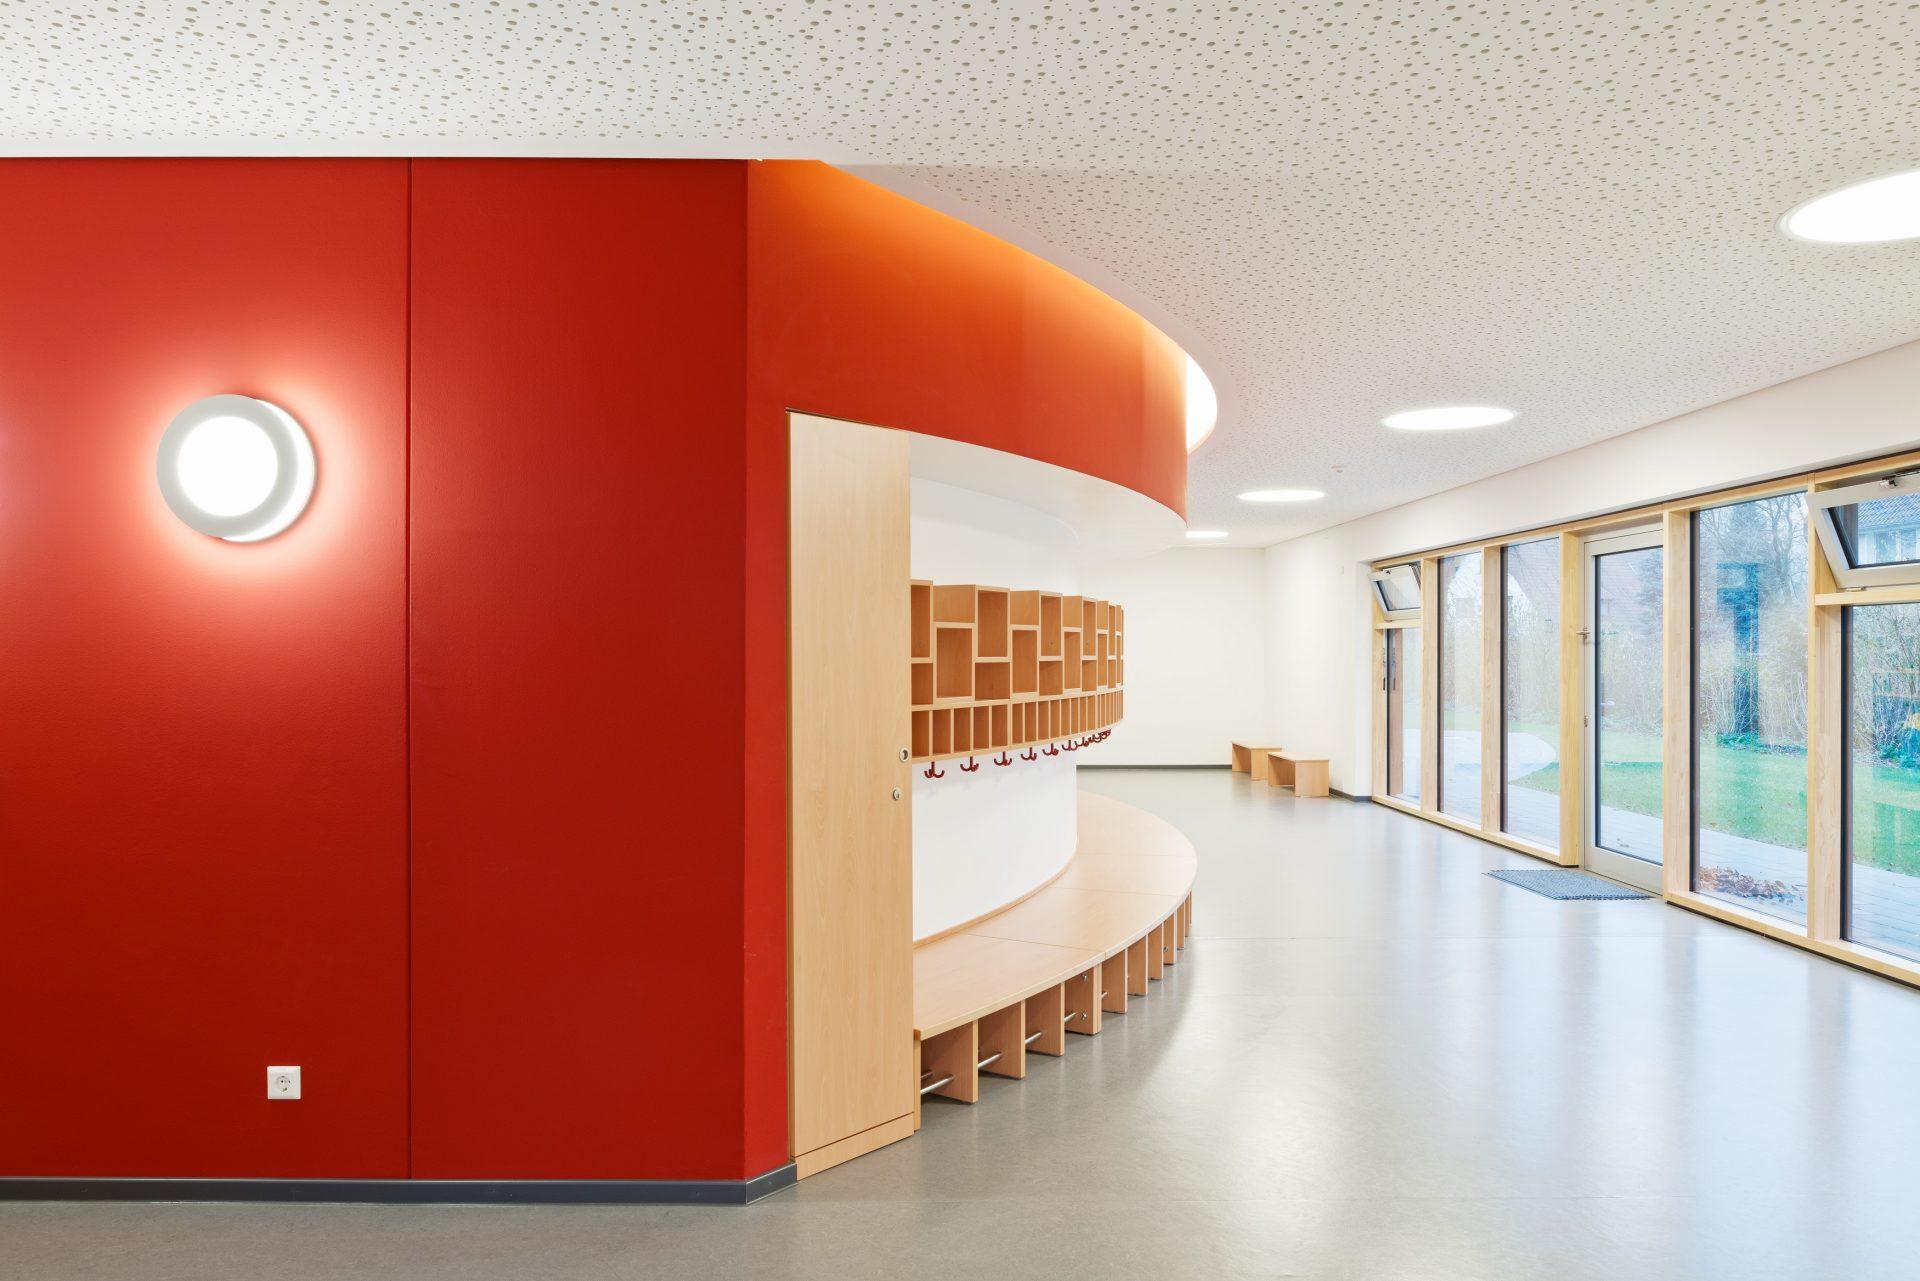 https://www.stricker-architekten.de/projekte/neubau-kita-heinrichstrasse-wunstorf/